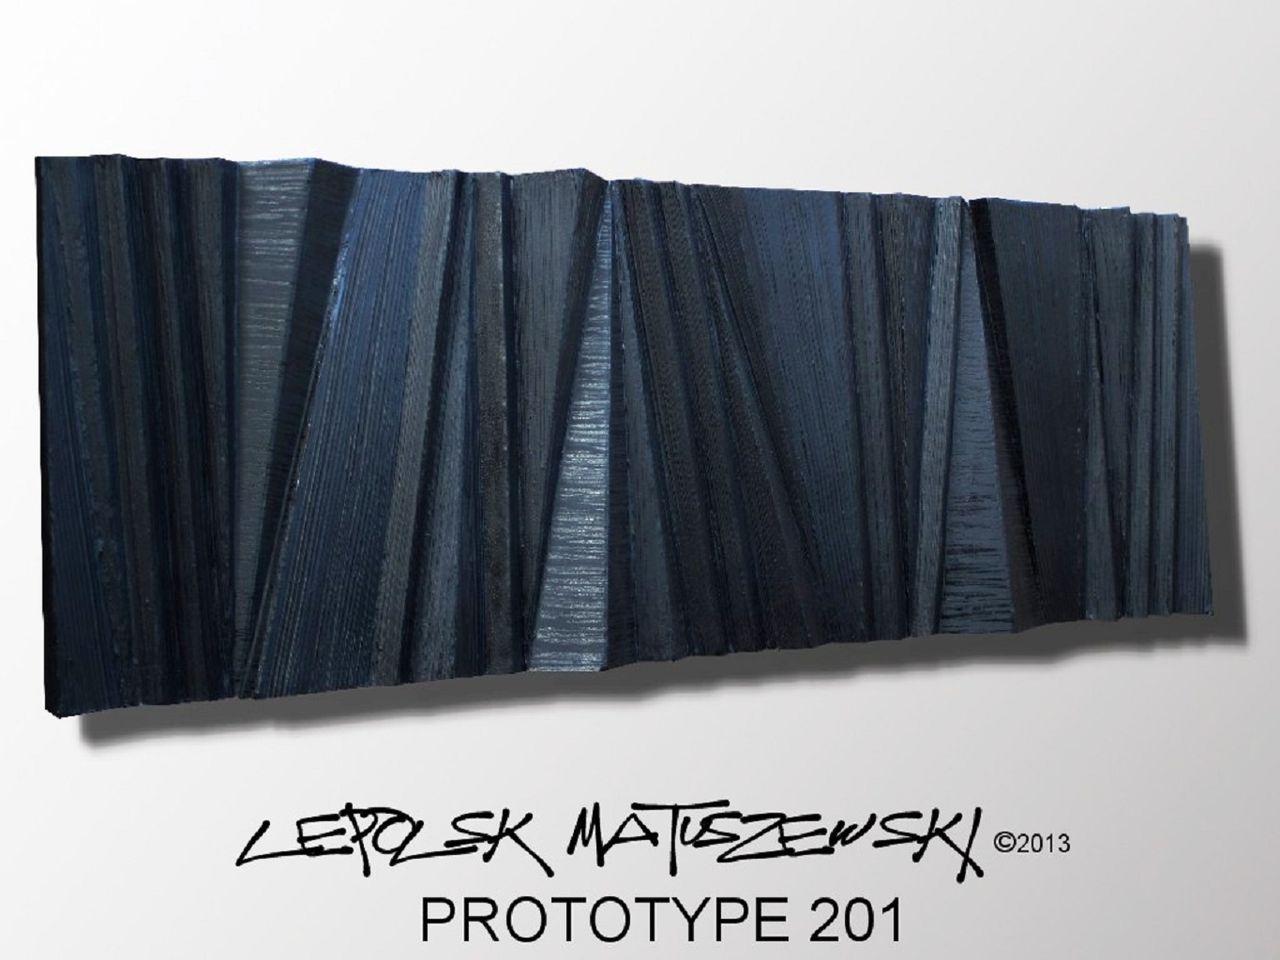 MISTER K  - Lepolsk Matuszewski PROTOTYPE 201  expressionnisme abstrait